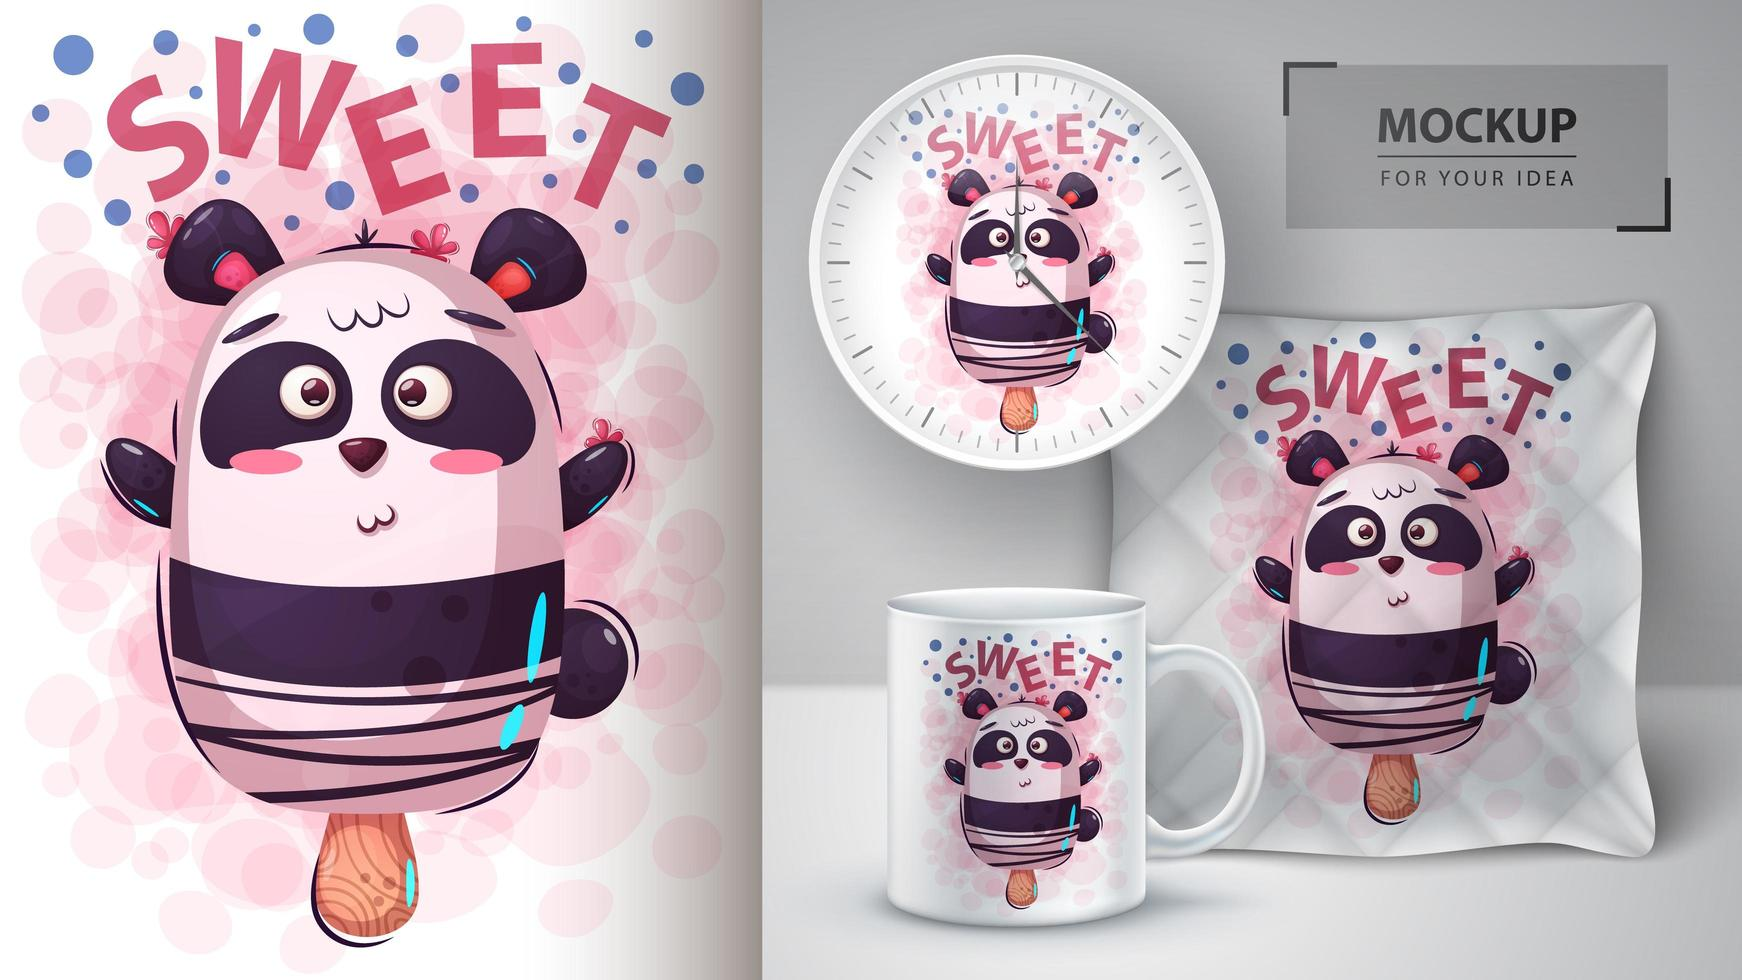 diseño de barra de helado de oso panda vector